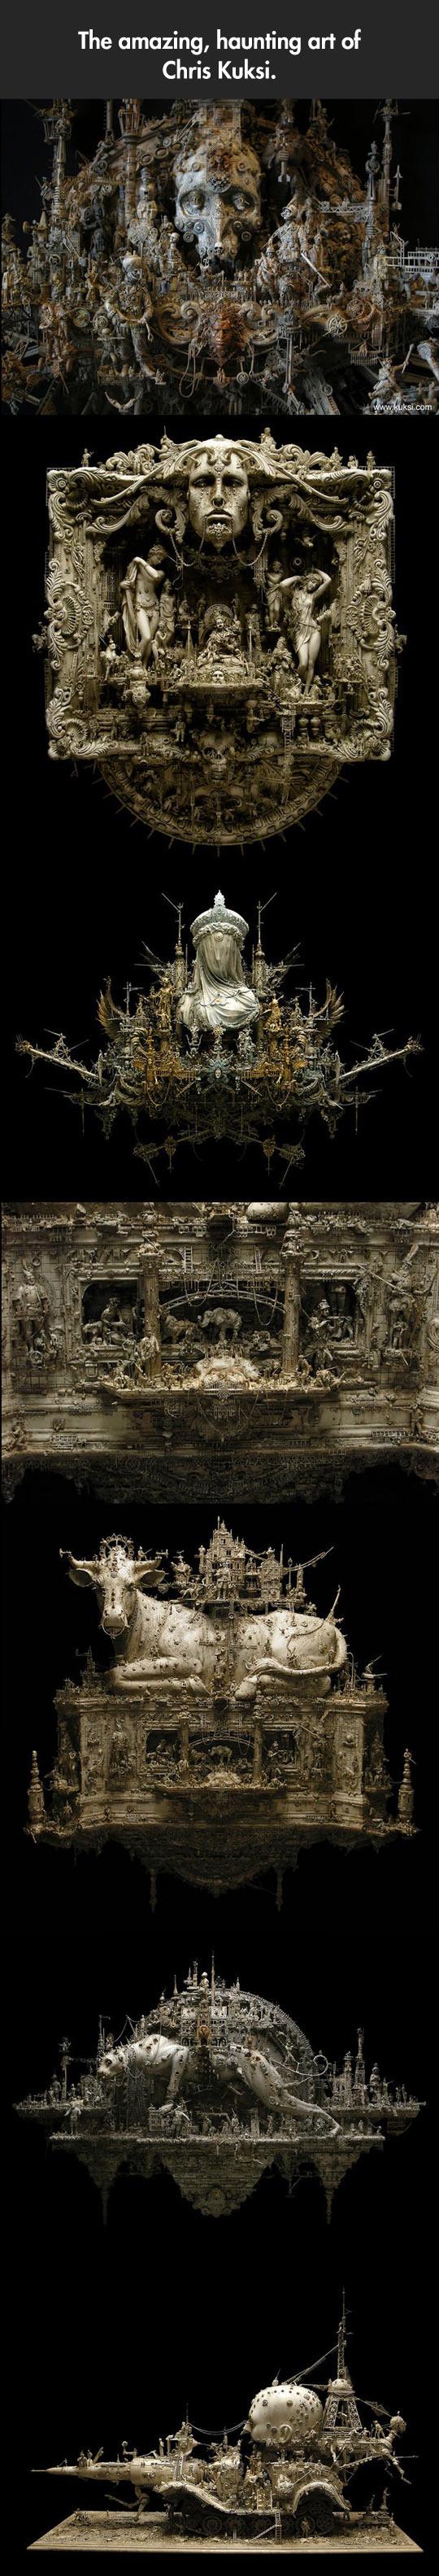 cool-art-Rococo-artistic-Chris-Kuksi